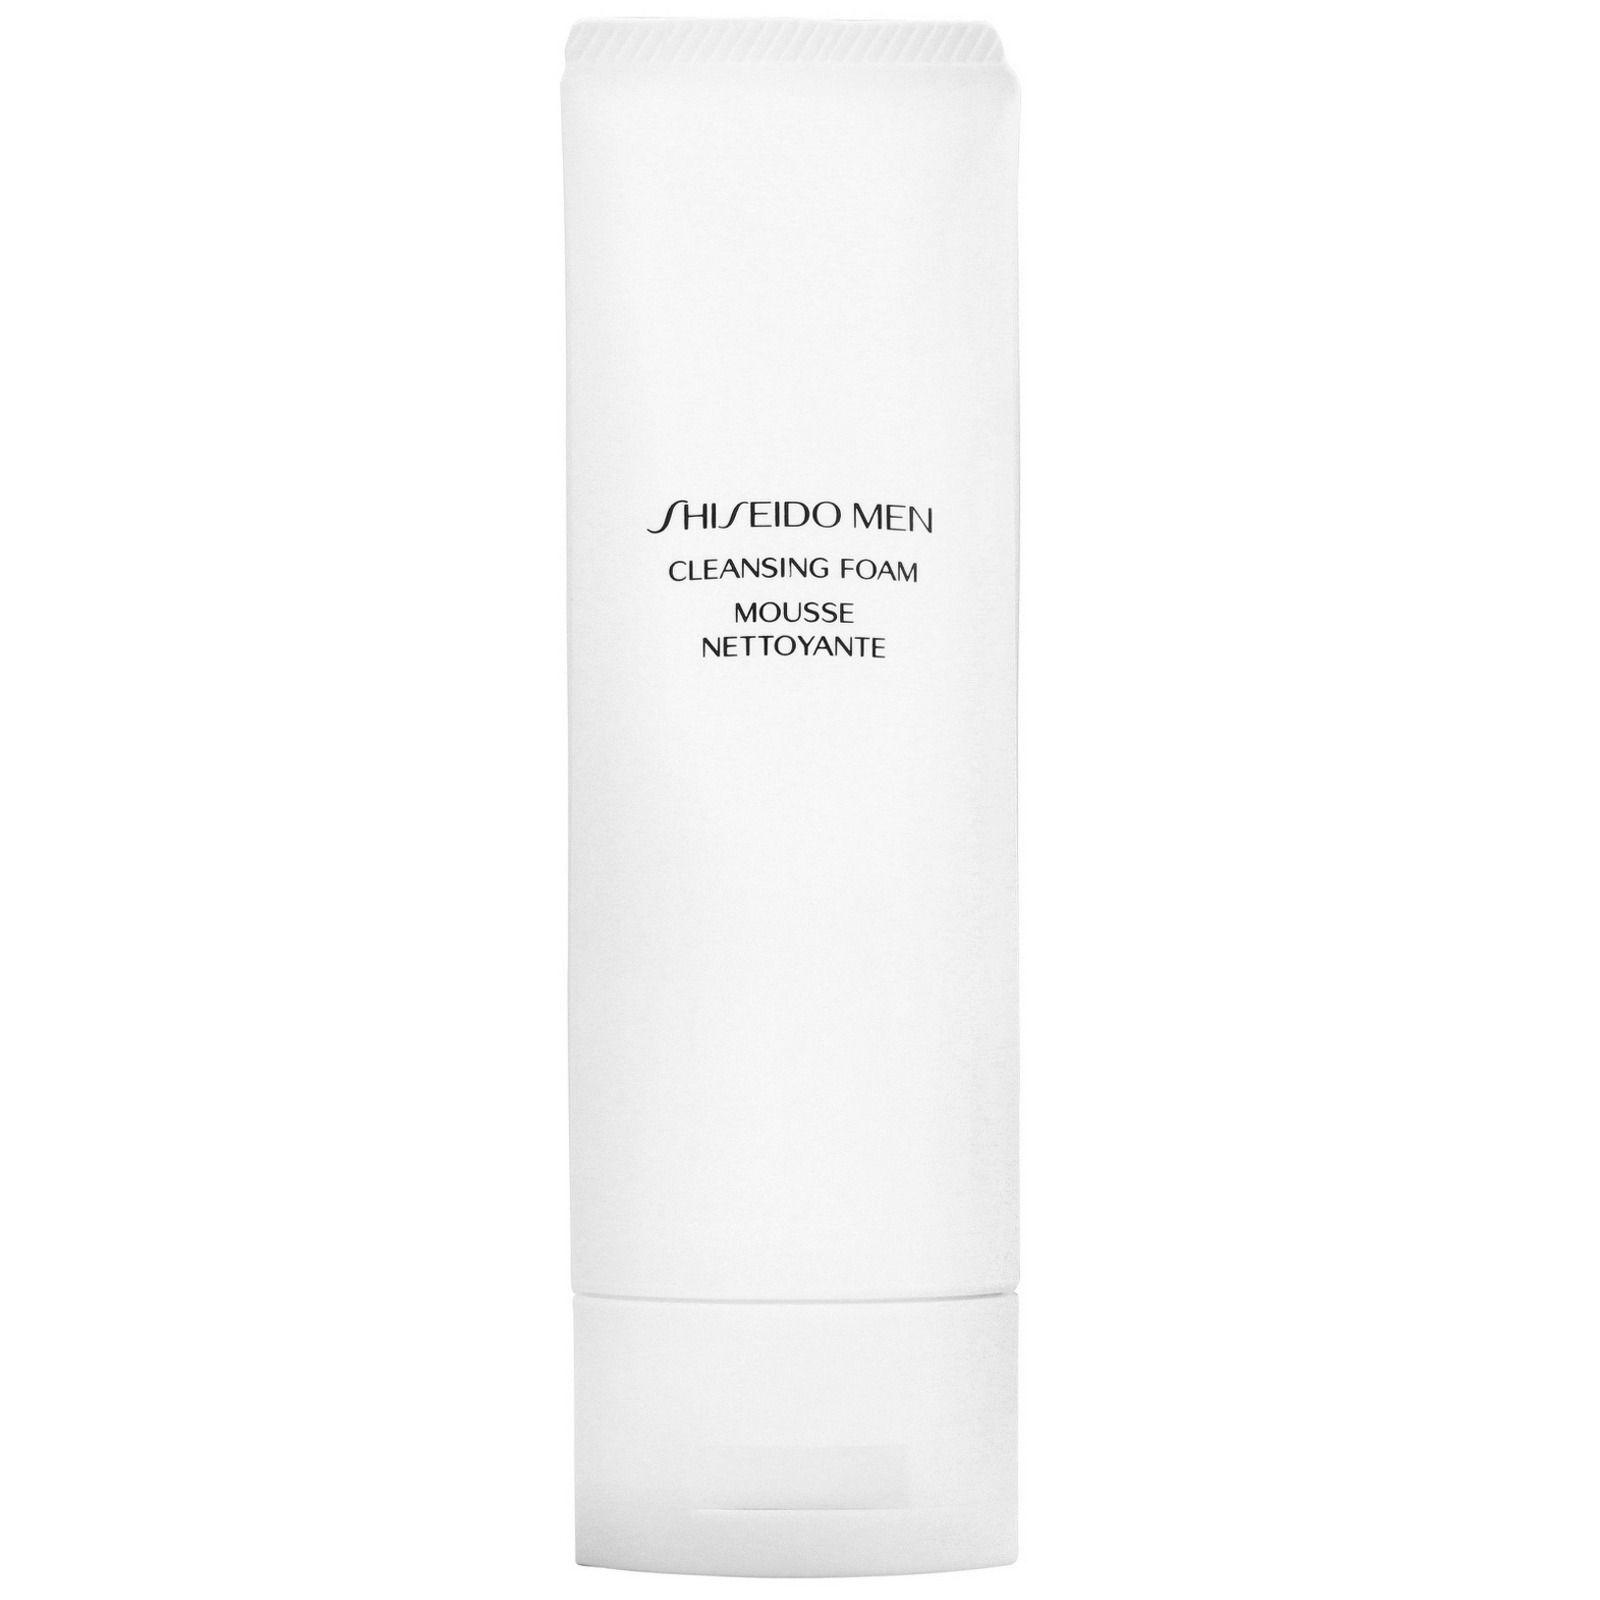 Shiseido Men Pulizia schiuma 125ml / 4.6 oz.